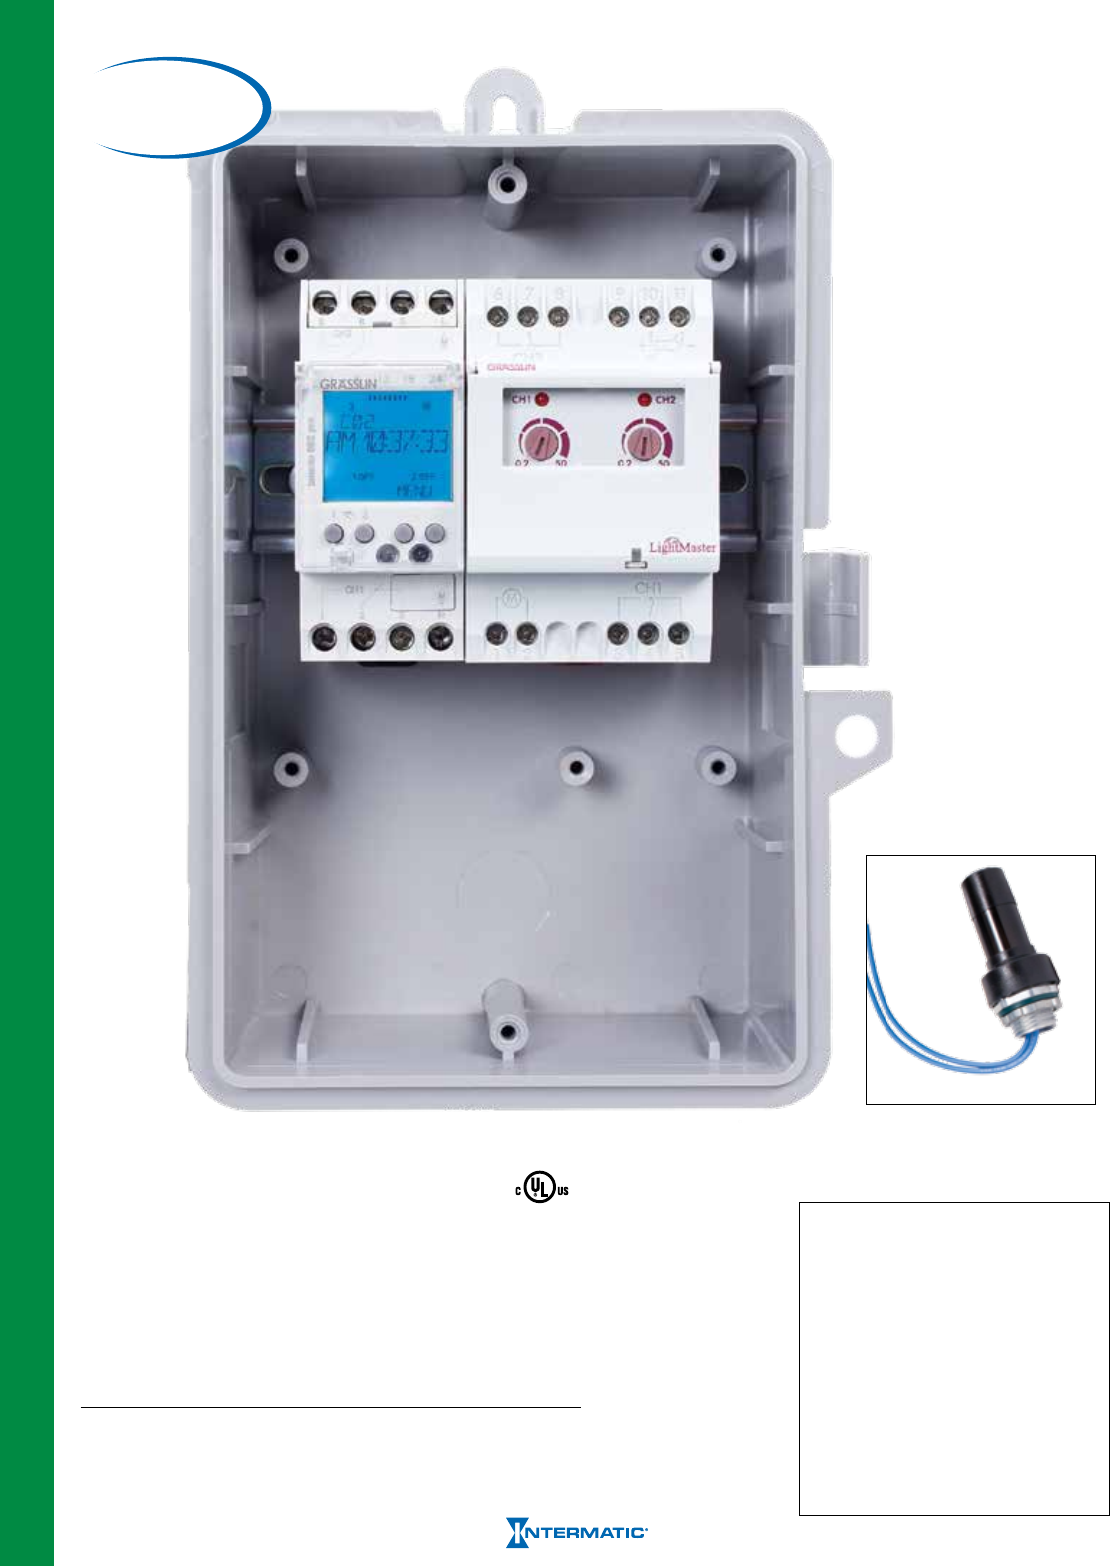 Intermatic K4321 Photocell Wiring Diagram Electrical Diagrams Spdt T106m 45647 Catalog K4121c